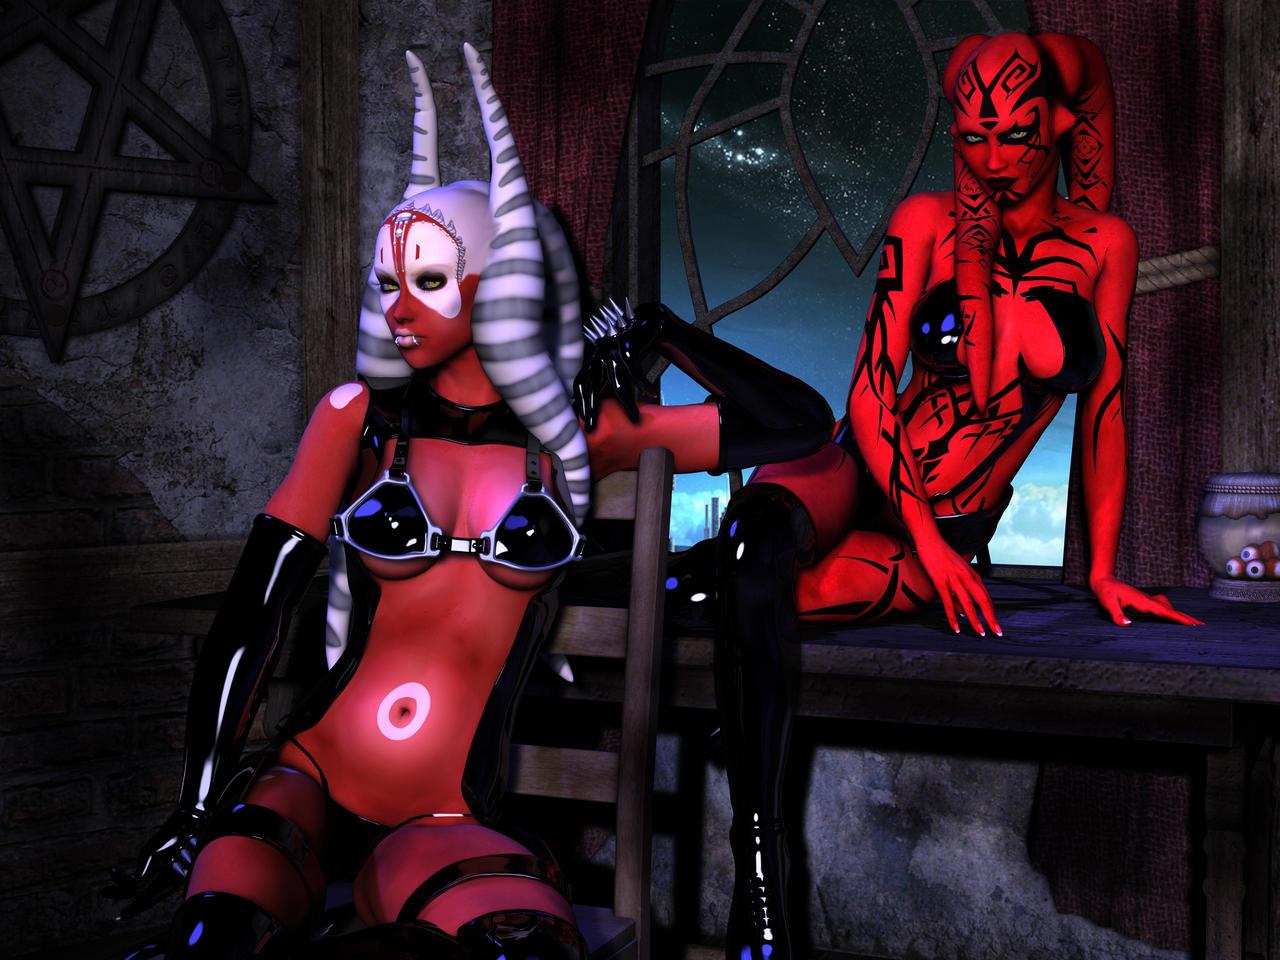 Twi lek slave hentai xxx stripper